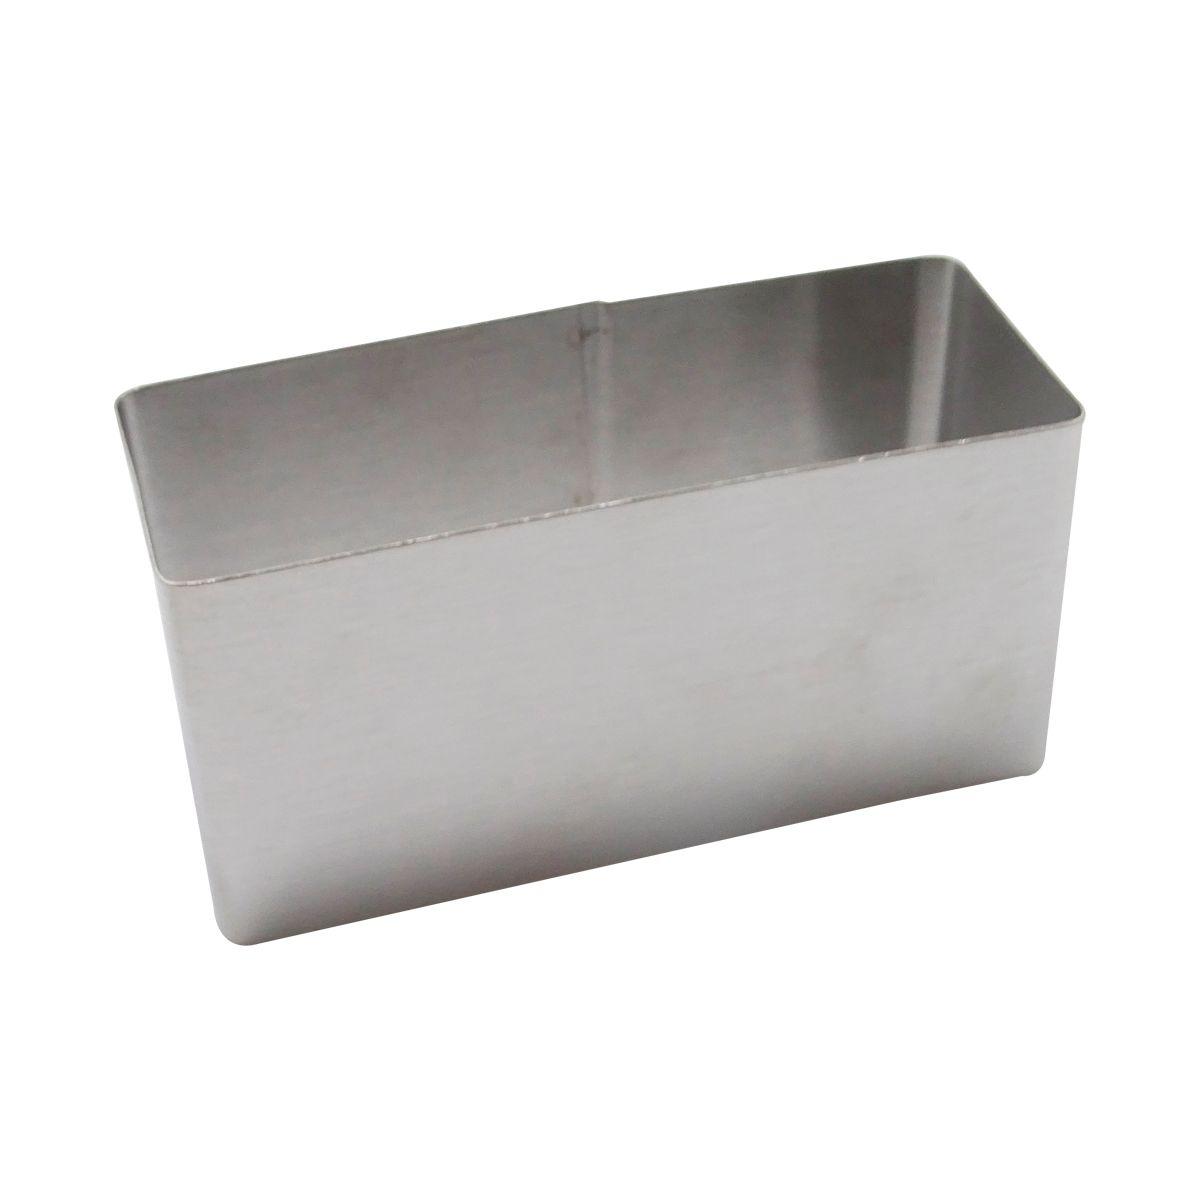 Rectangle inox 9cmx4cm h4.5 cm - Alice Délice